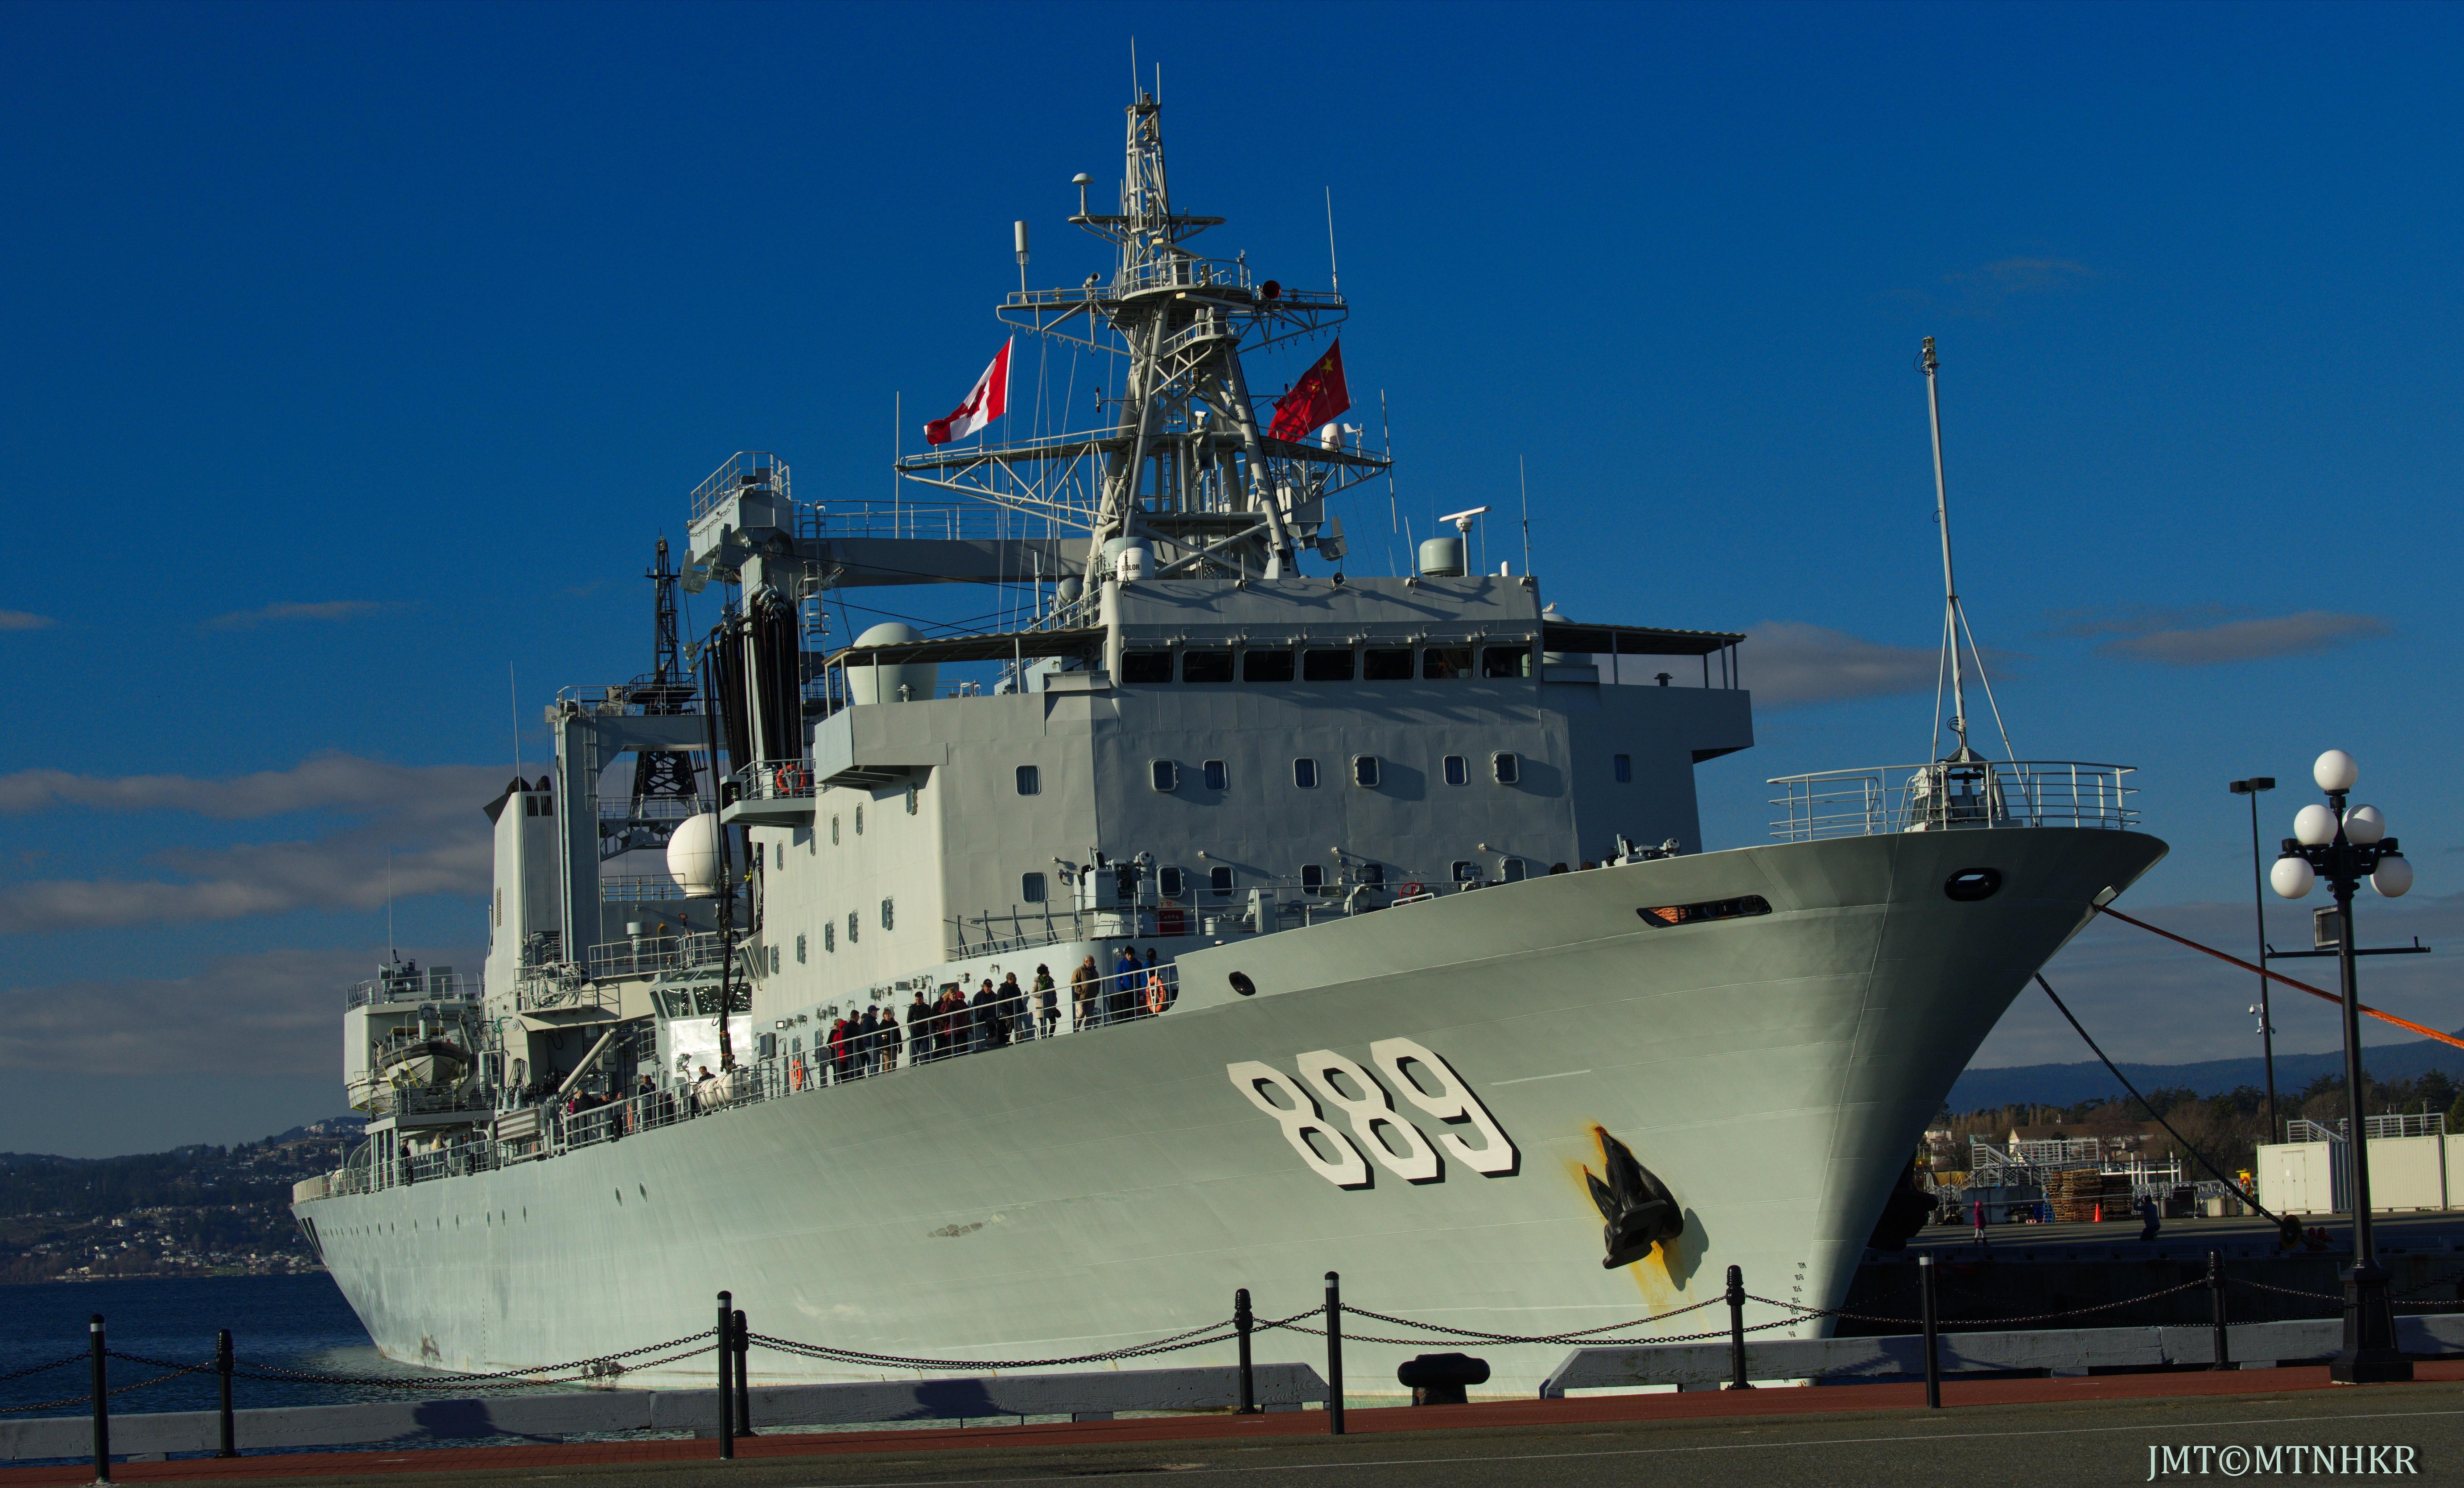 Marine chinoise - Chinese navy - Page 9 30883557773_58b64687fe_o